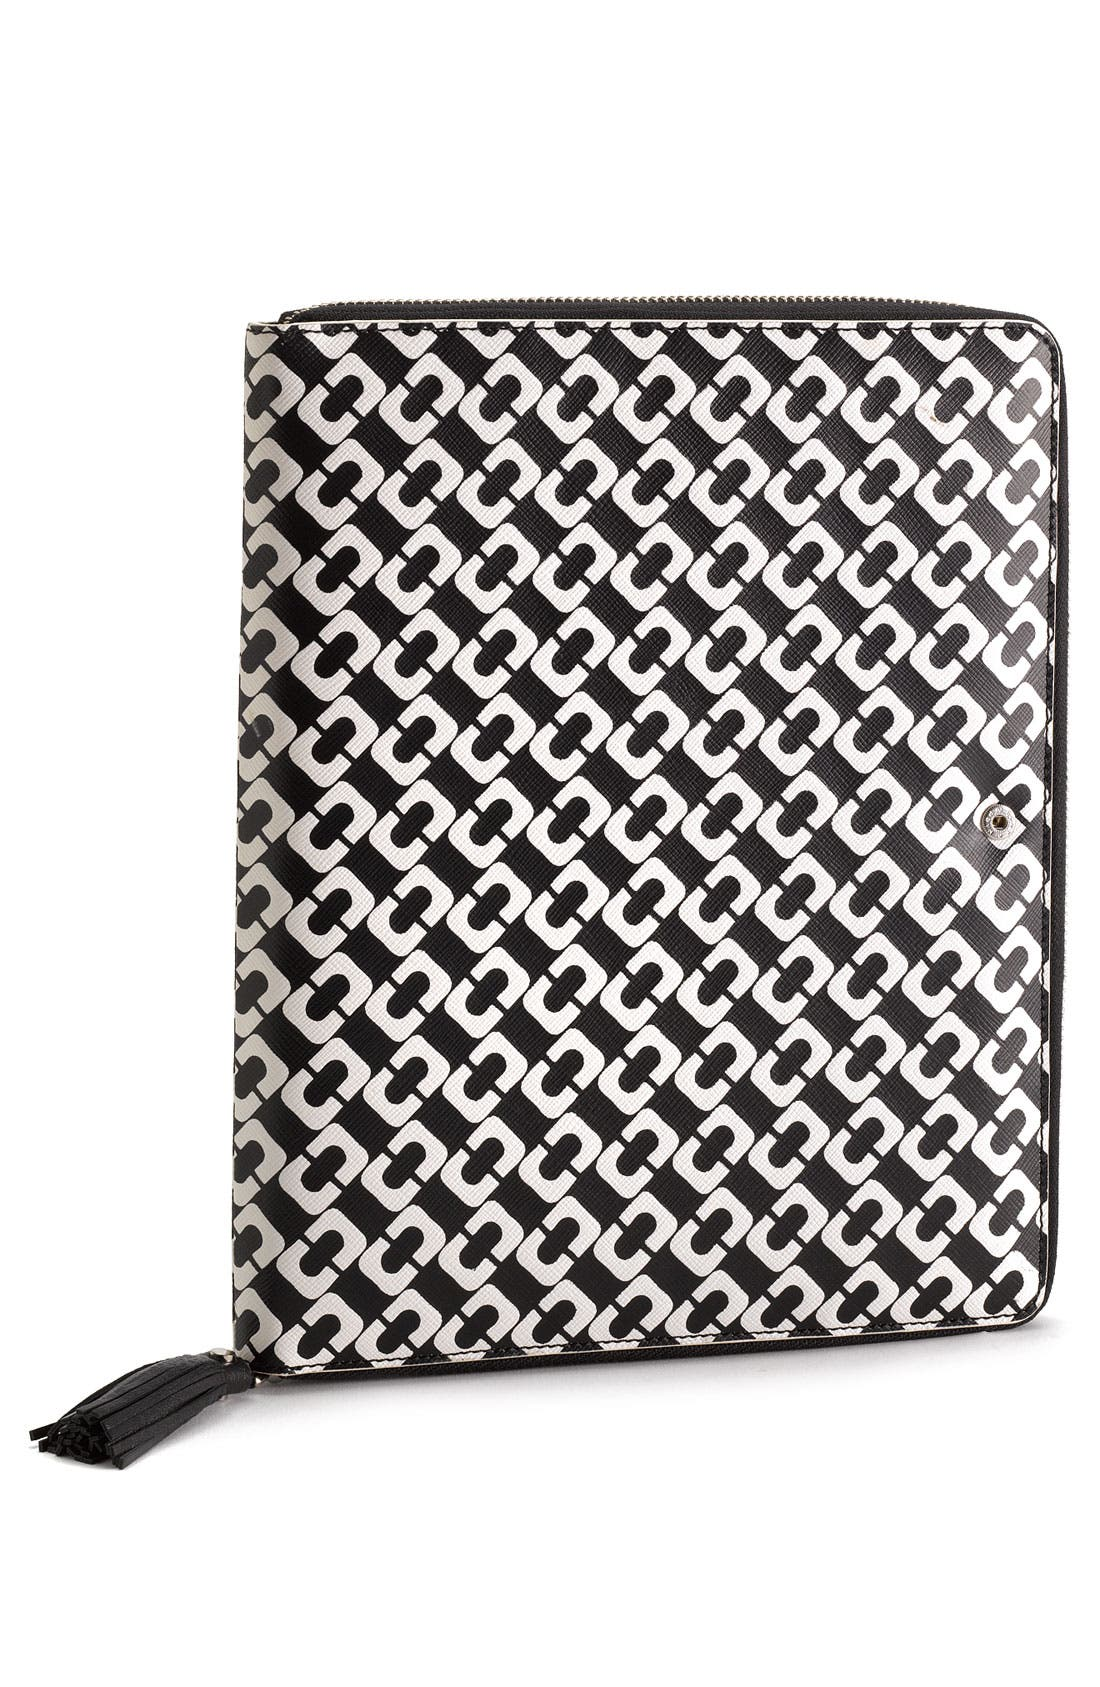 Alternate Image 1 Selected - Diane von Furstenberg Print iPad Case